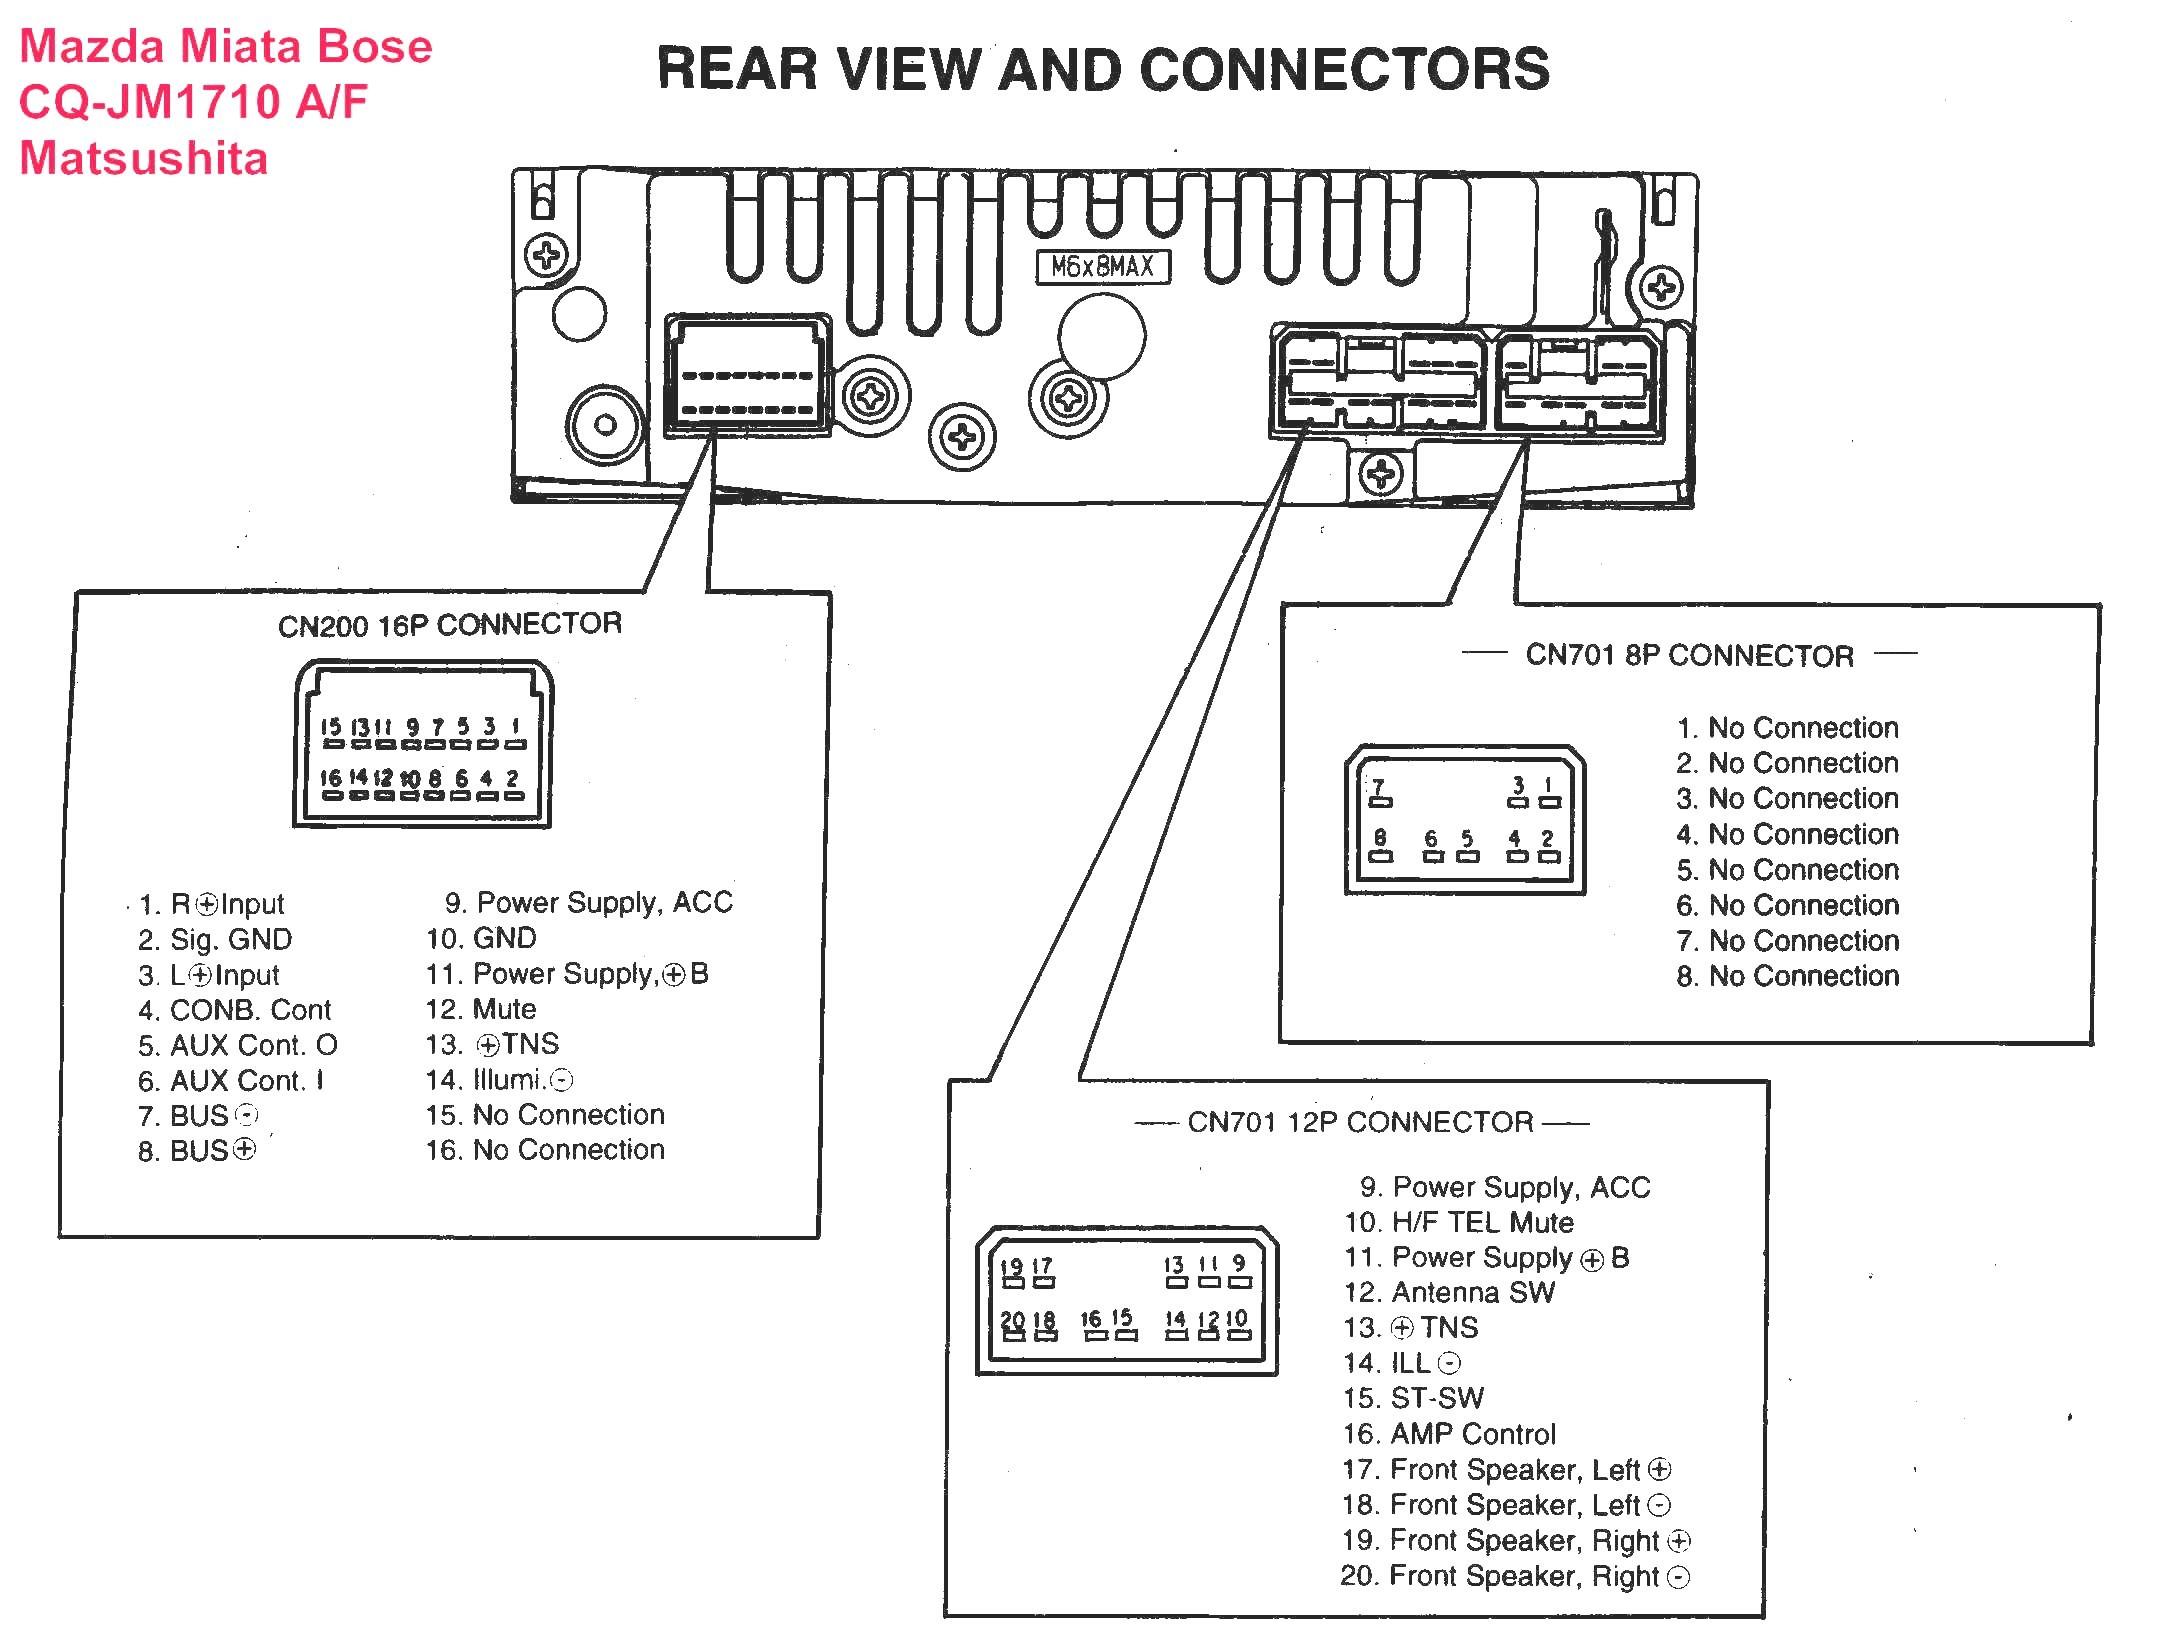 Wiring Diagram for Car Amplifier Car Diagram Awesome Kenwood Car Audio Wiring Diagram Image Ideas Of Wiring Diagram for Car Amplifier